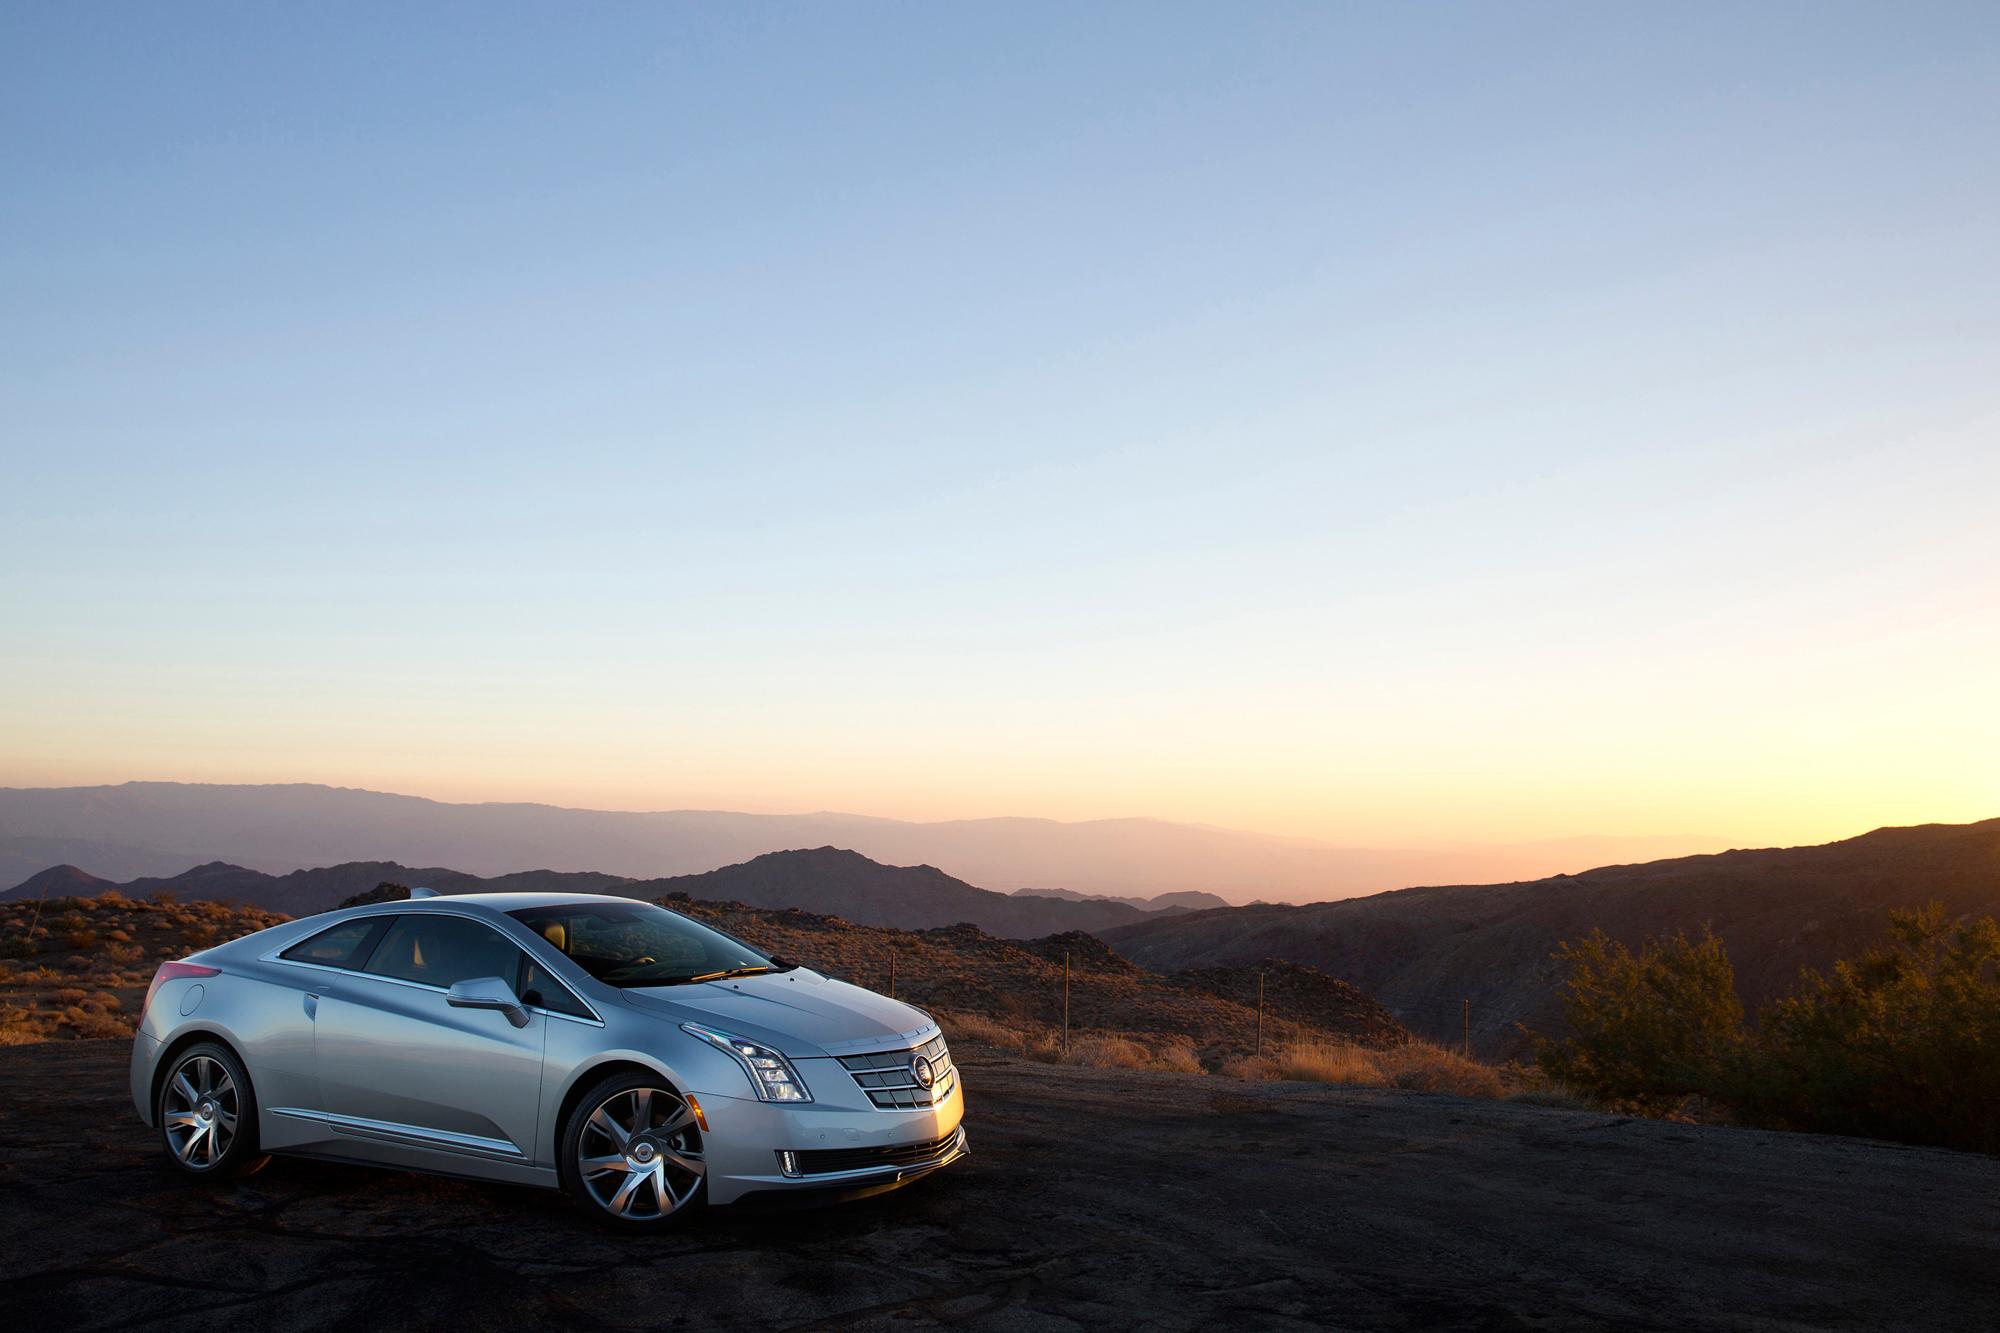 Cadillac ELR range-extender hybrid luxury sports car